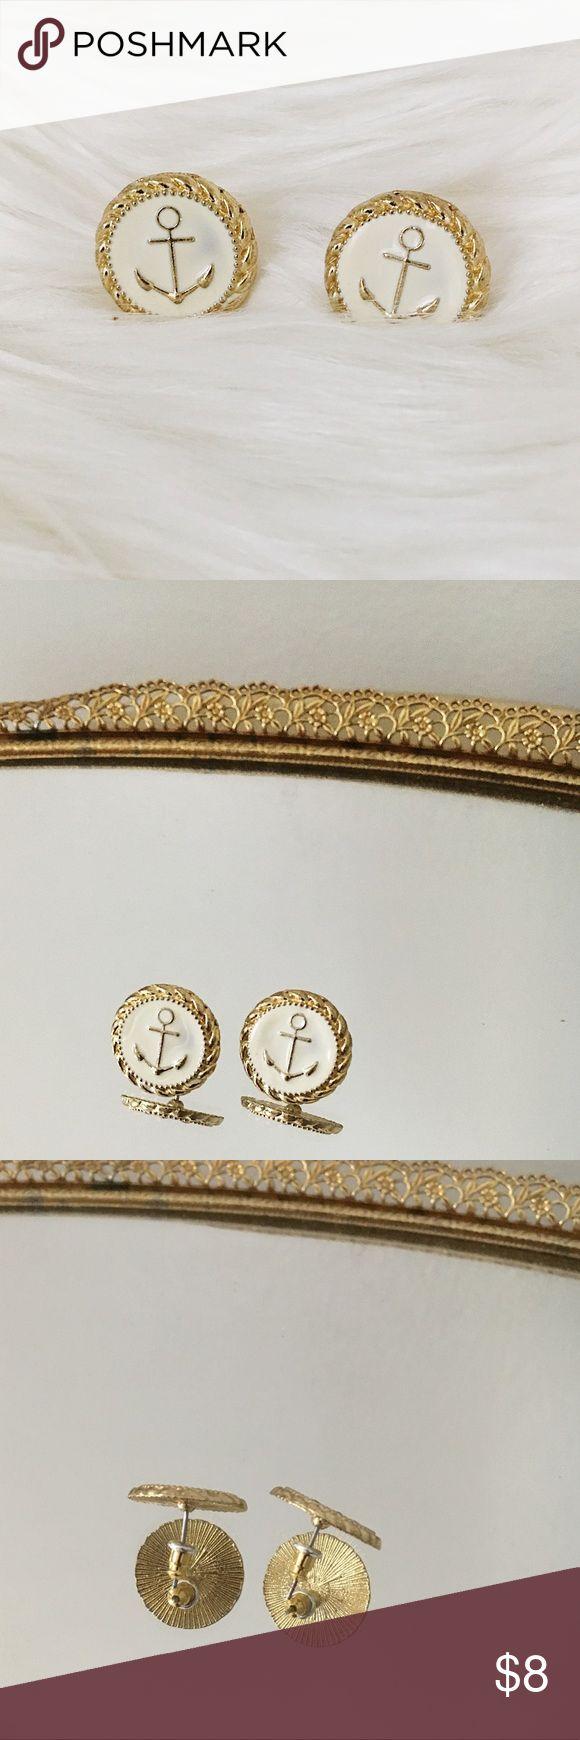 Preppy Anchor Earrings Circular  Pierced Anchor earring  NWOT Gold & white Jewelry Earrings